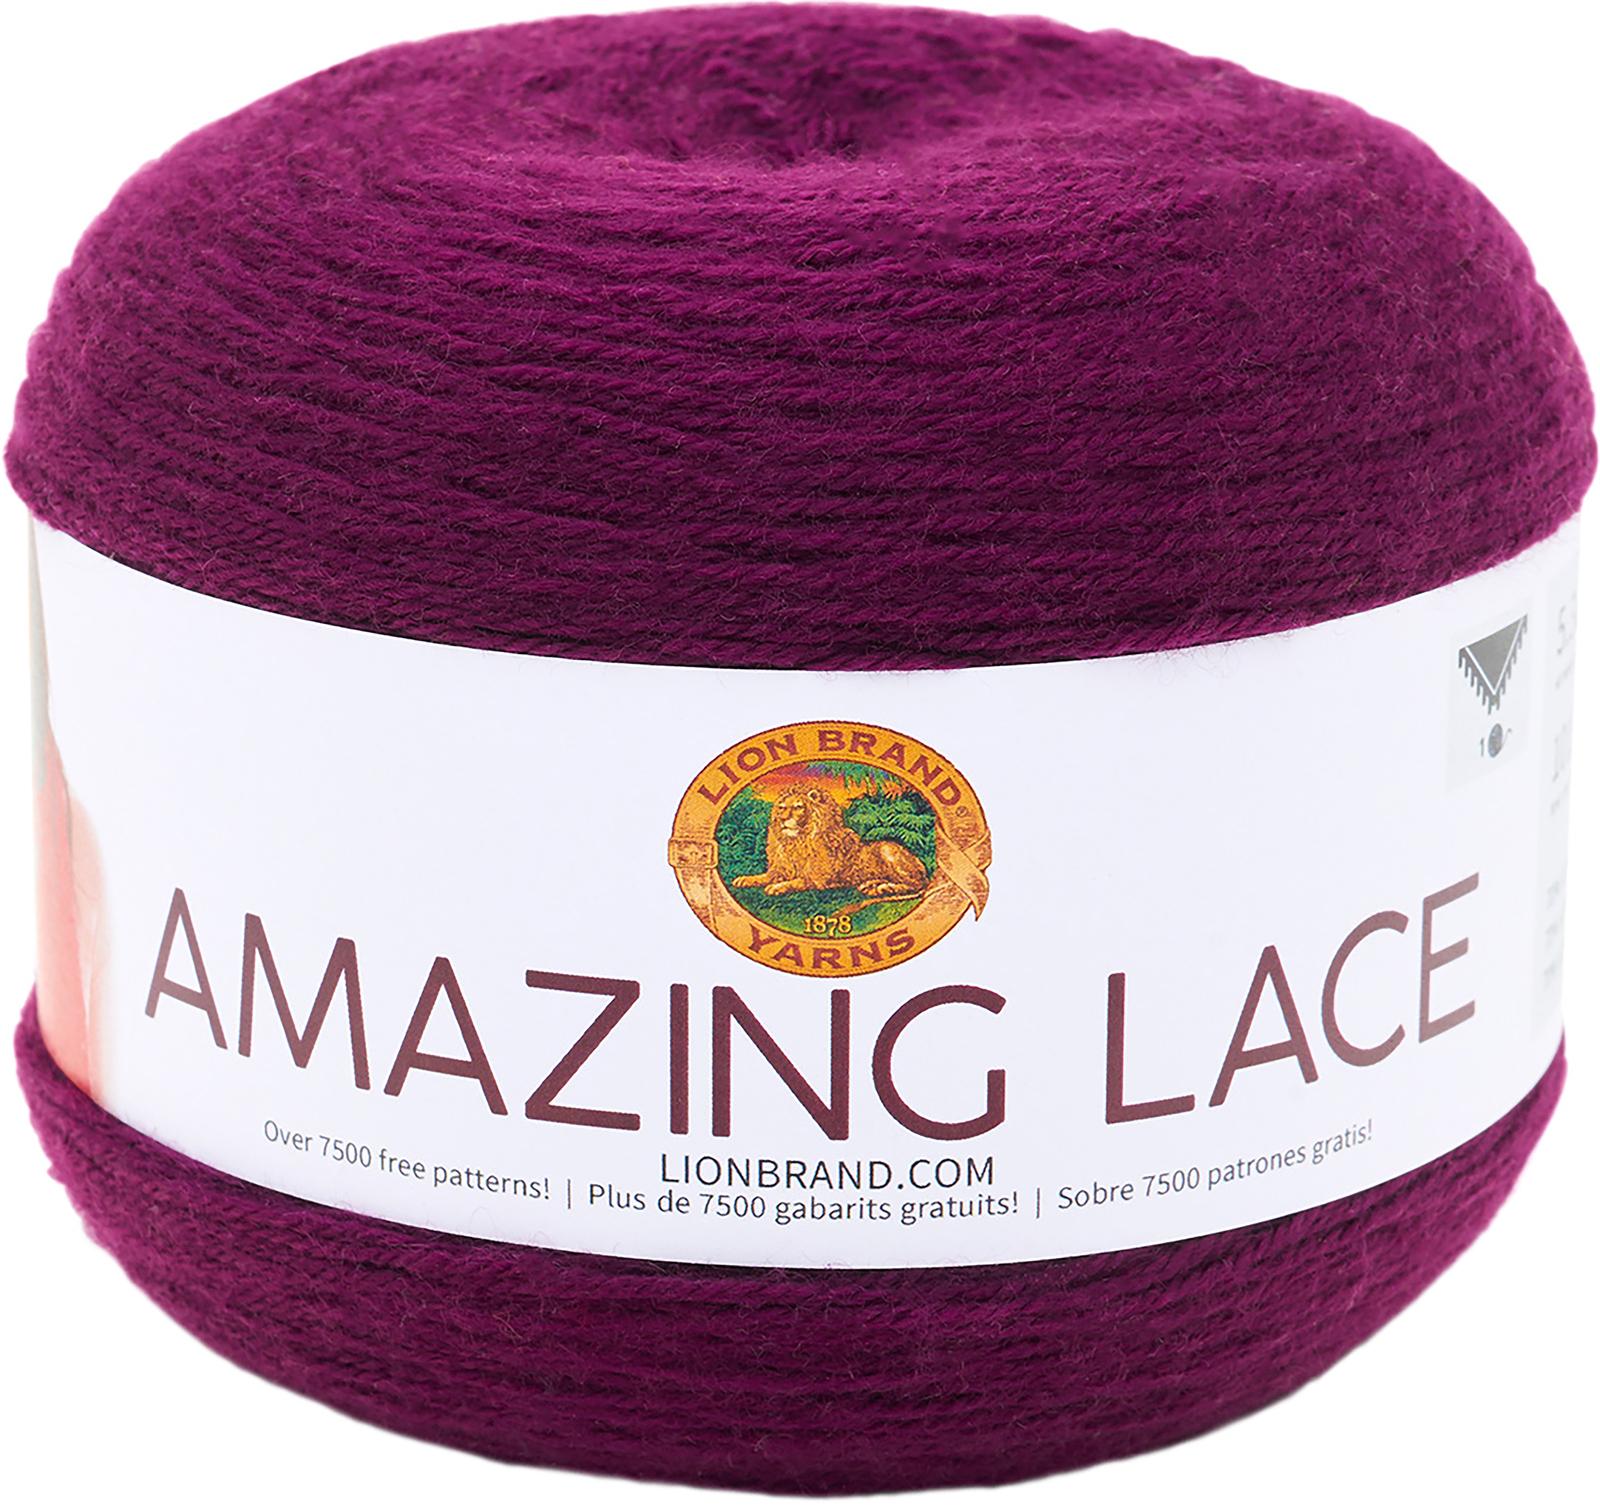 Lion Brand Amazing Lace-Eggplant Trellis - $20.50